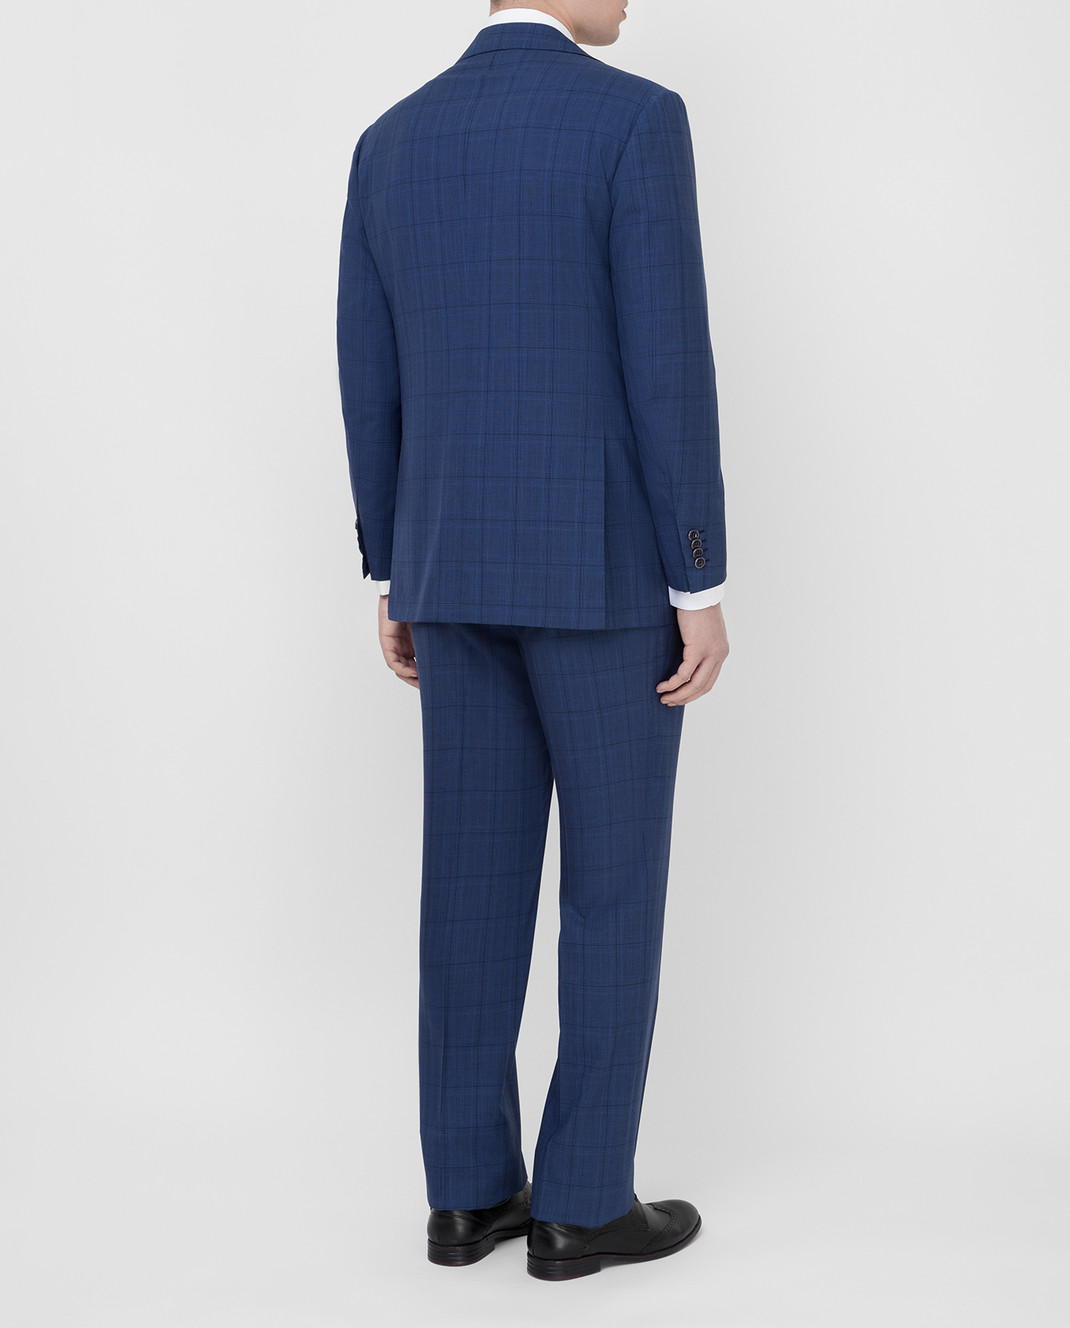 Kiton Темно-синий костюм из шерсти изображение 4